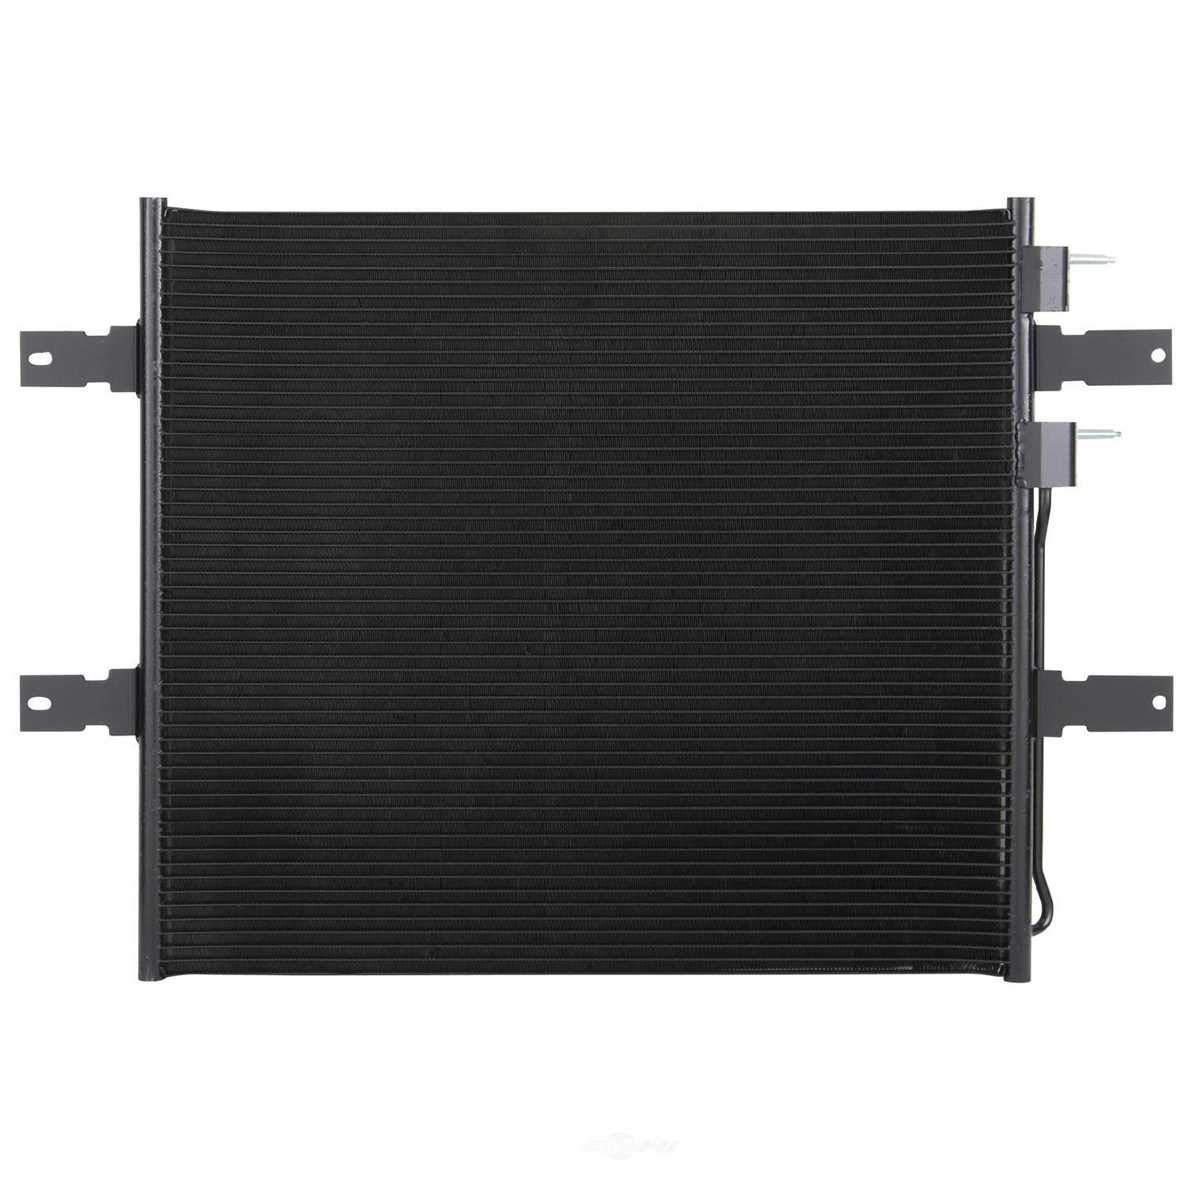 Prime Choice Auto Parts ACC83659 New A//C Condenser fits 2007-2009 Dodge Ram 2500 Ram 3500 Ram 4500 Ram 5500